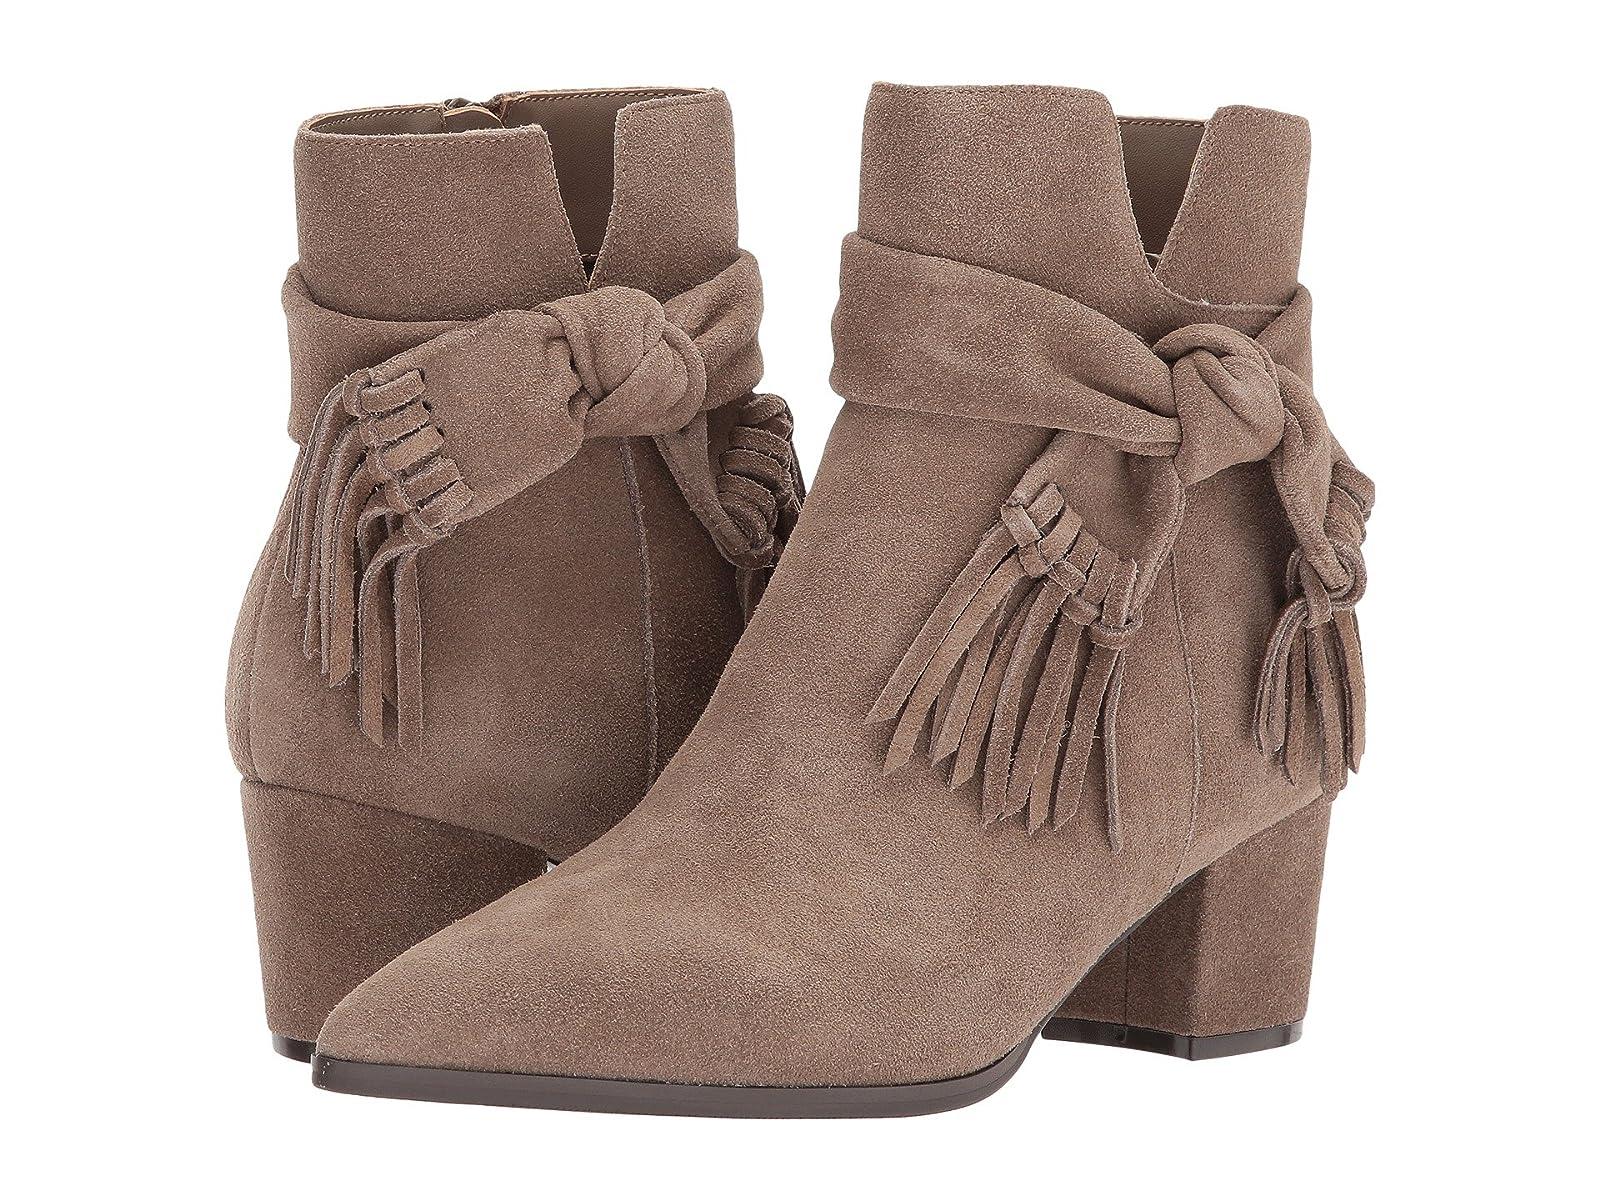 Vaneli XanderCheap and distinctive eye-catching shoes